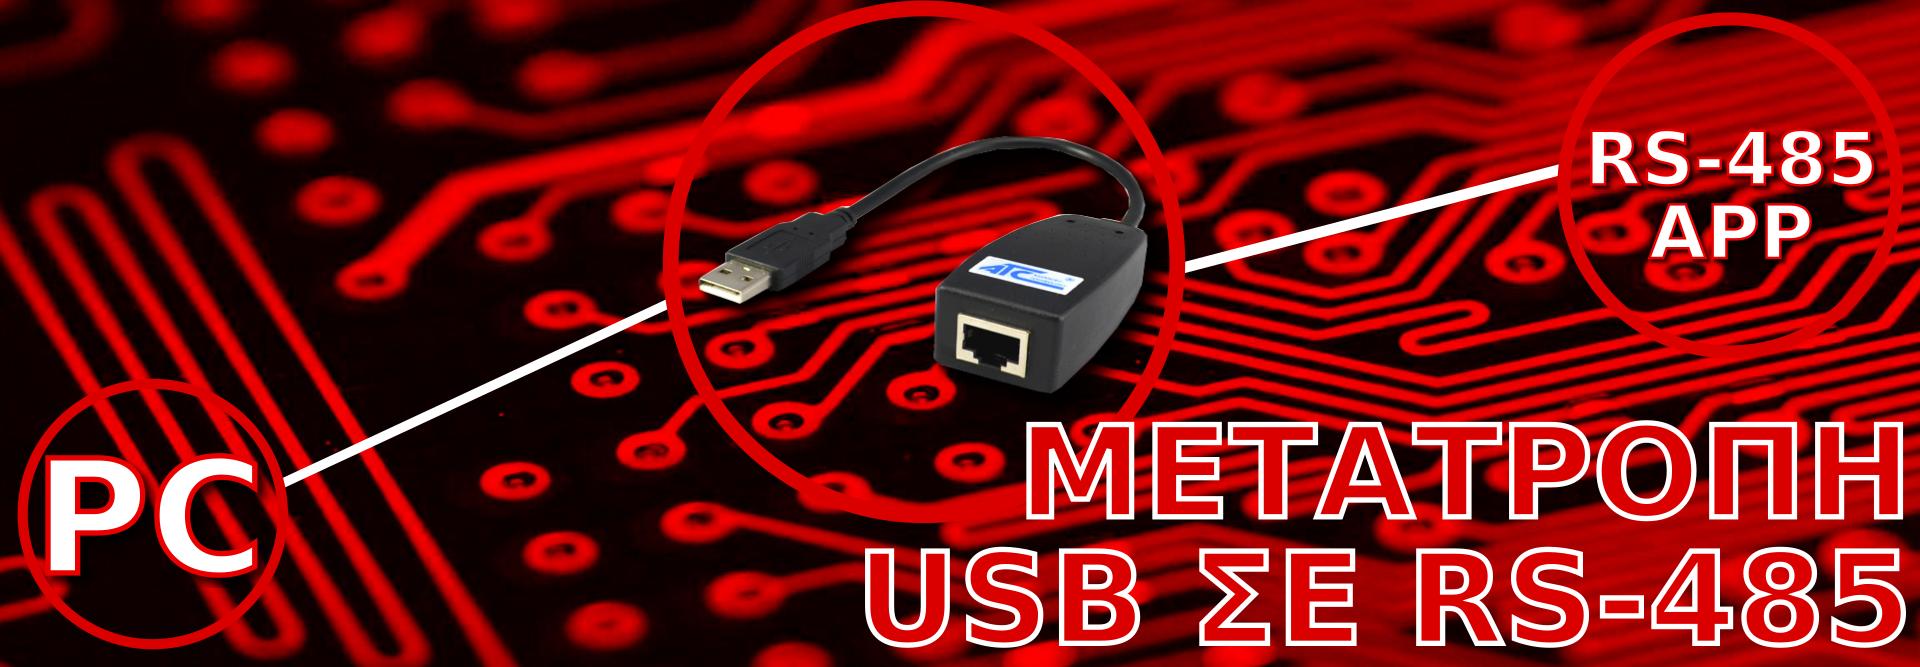 ATC-820B Μετατροπές USB σε RS-485